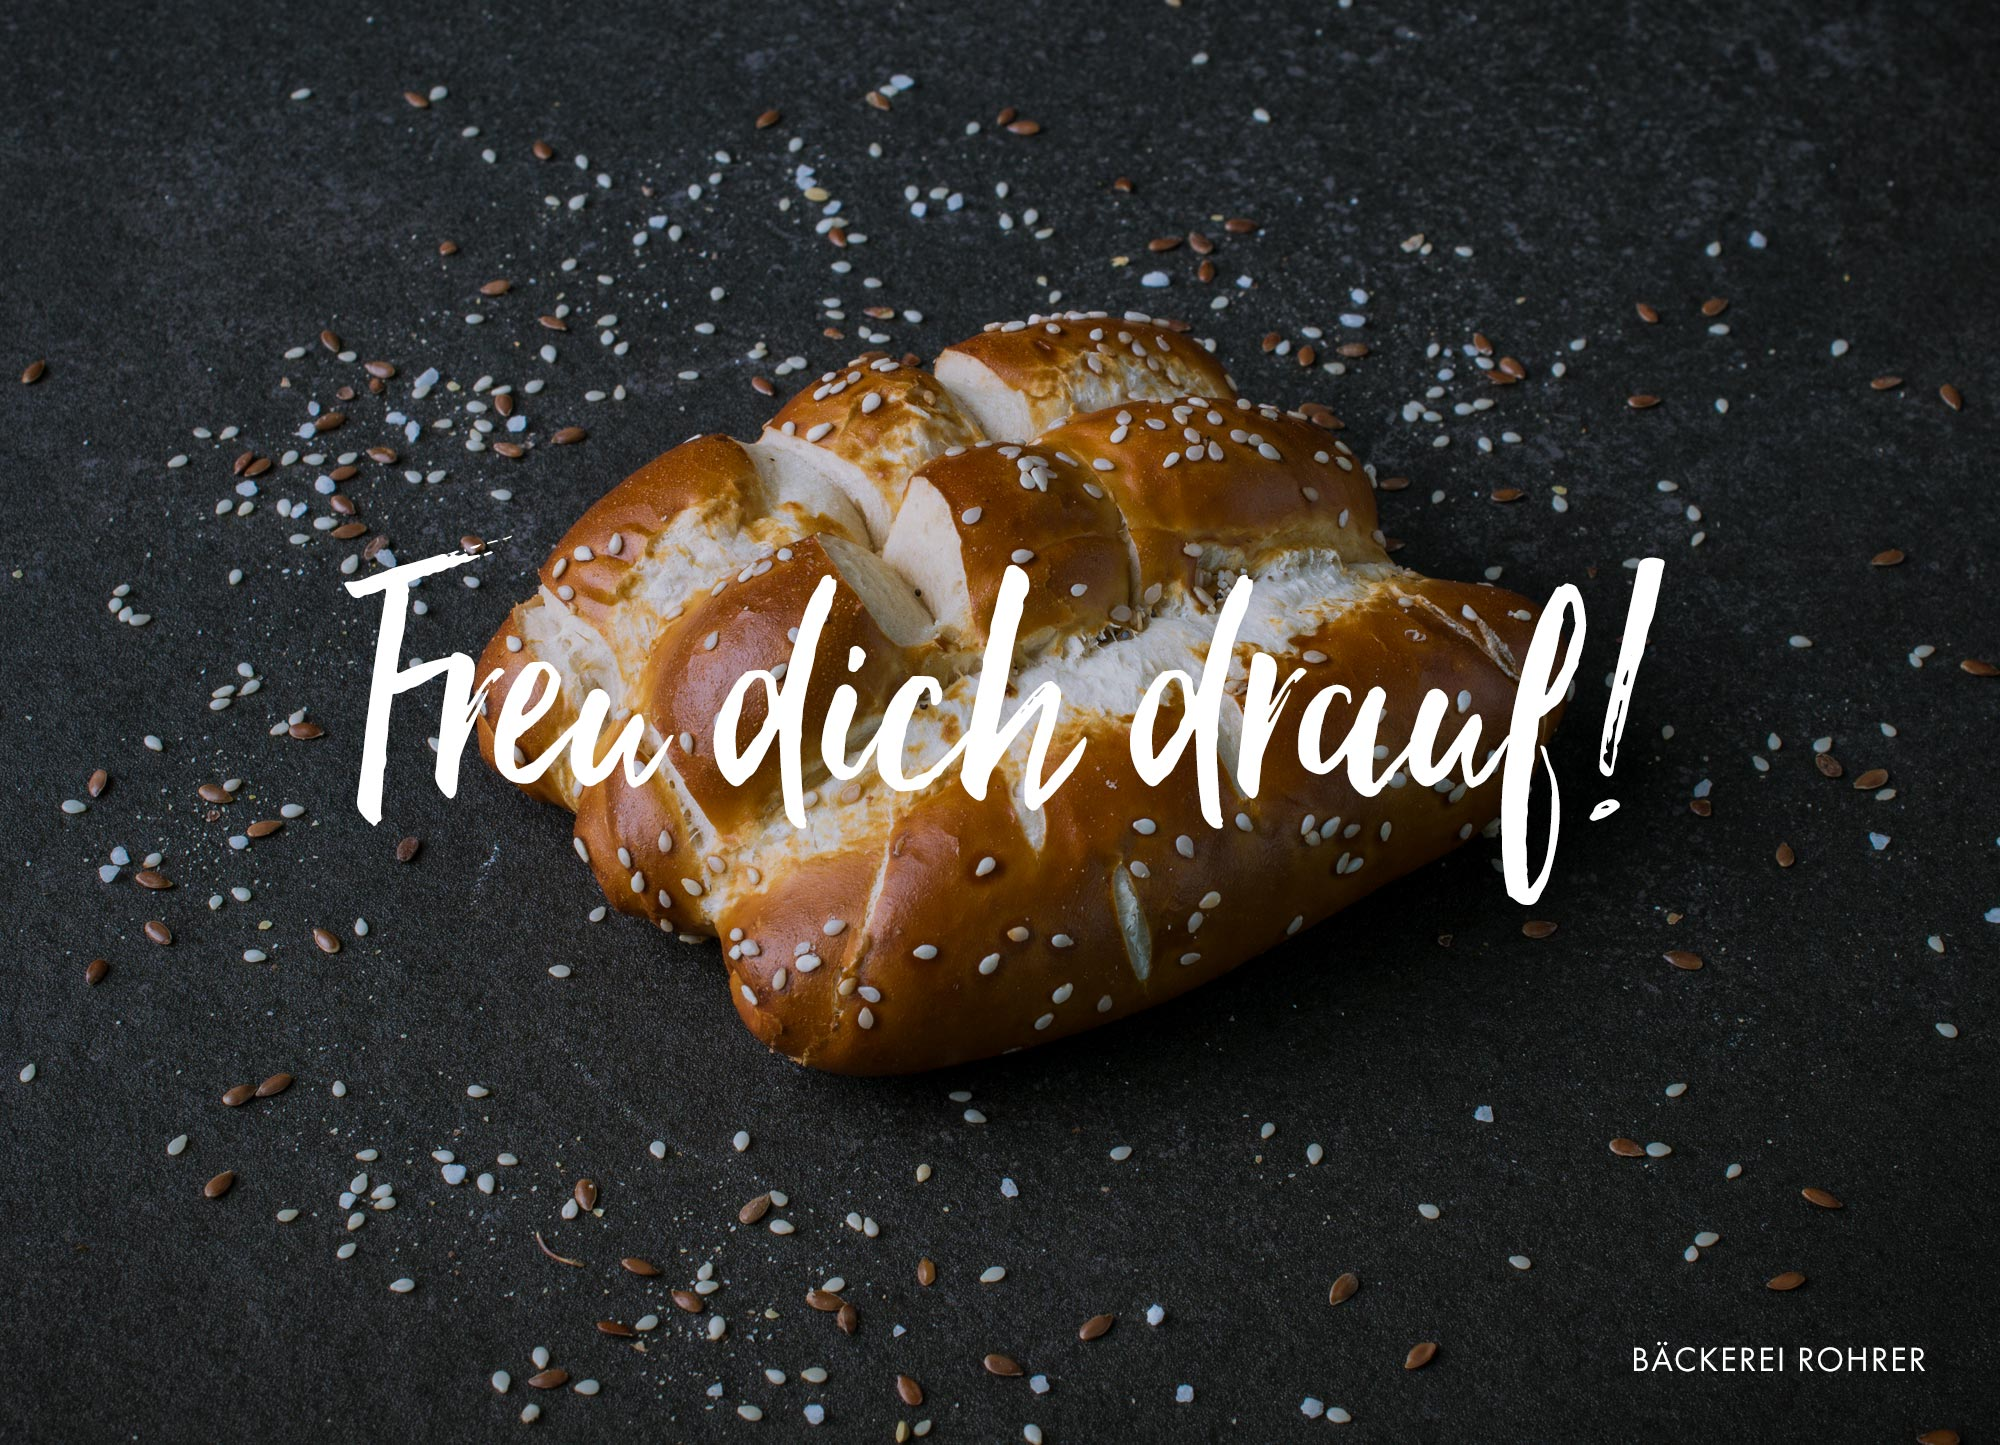 Bäckerei Rohrer-Fotografie-Agentur B.